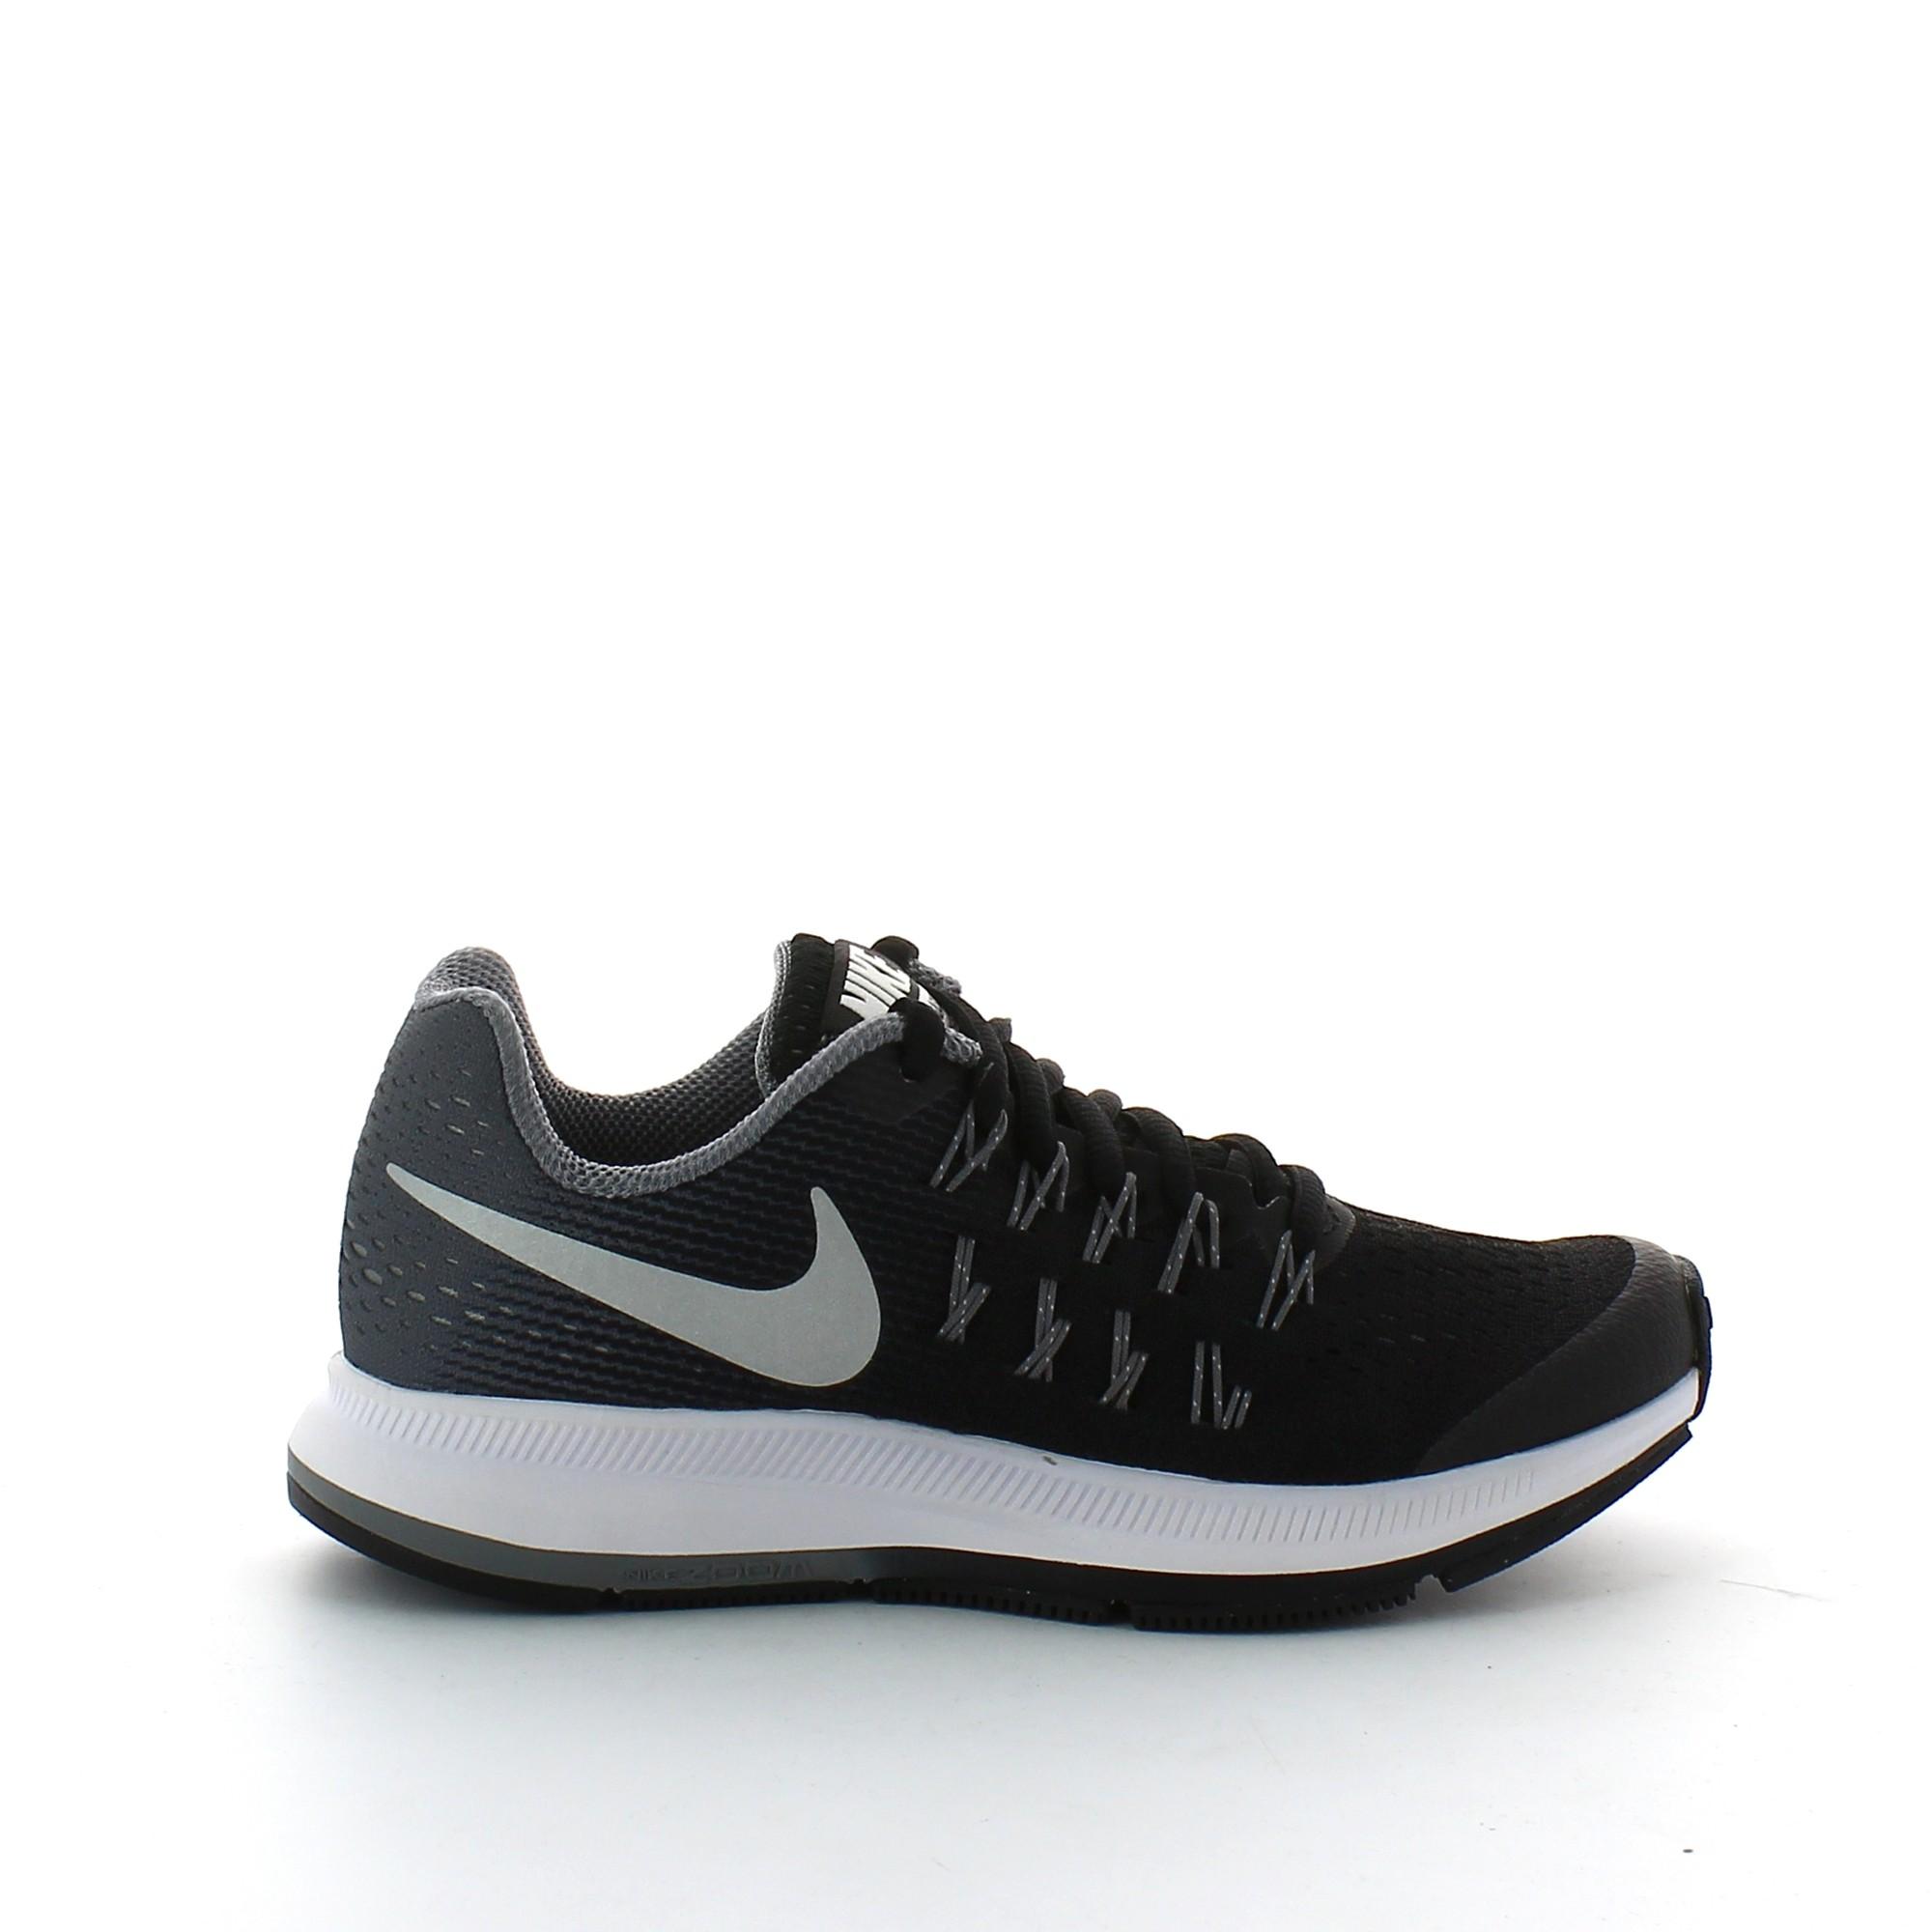 Zapatilla Nike Zoom Pegasus 33 Gs Negro Gris Junior